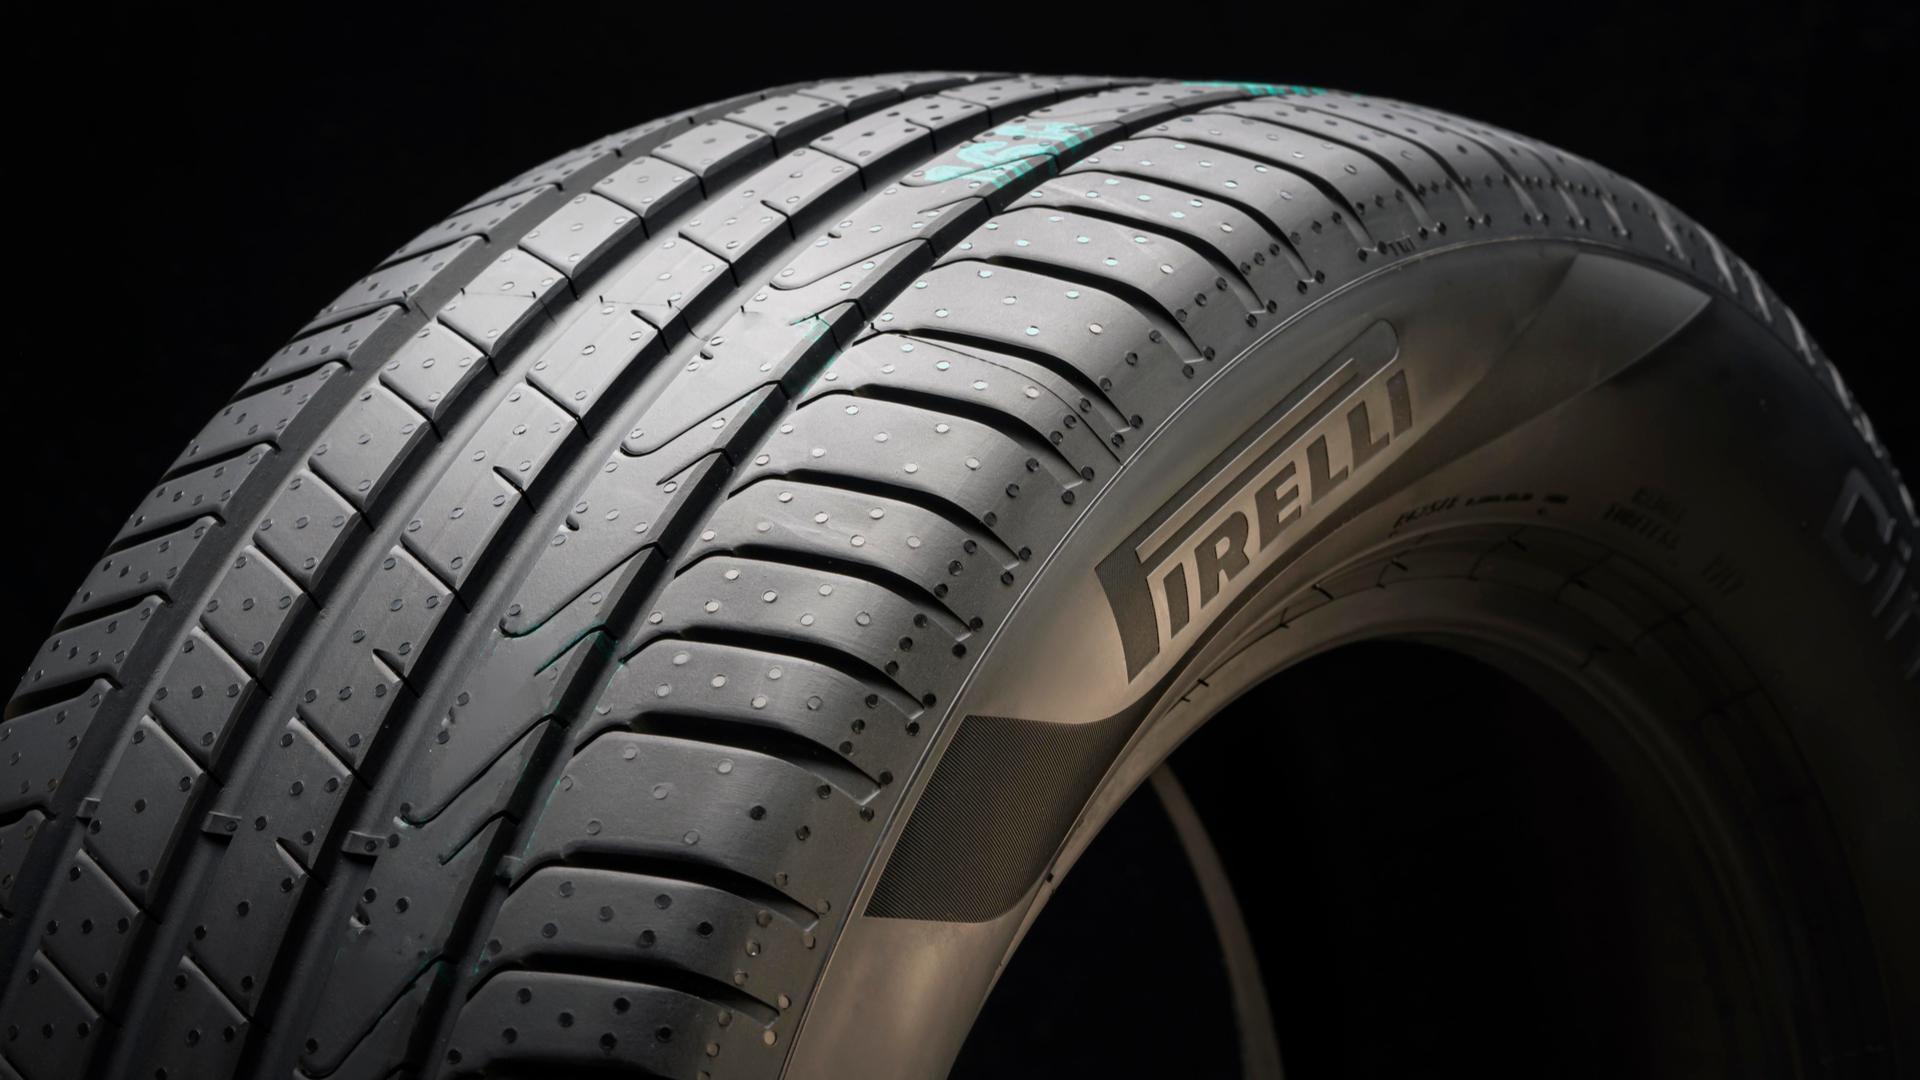 pneu brasileiro qualidade pirelli shutterstock 1683655321